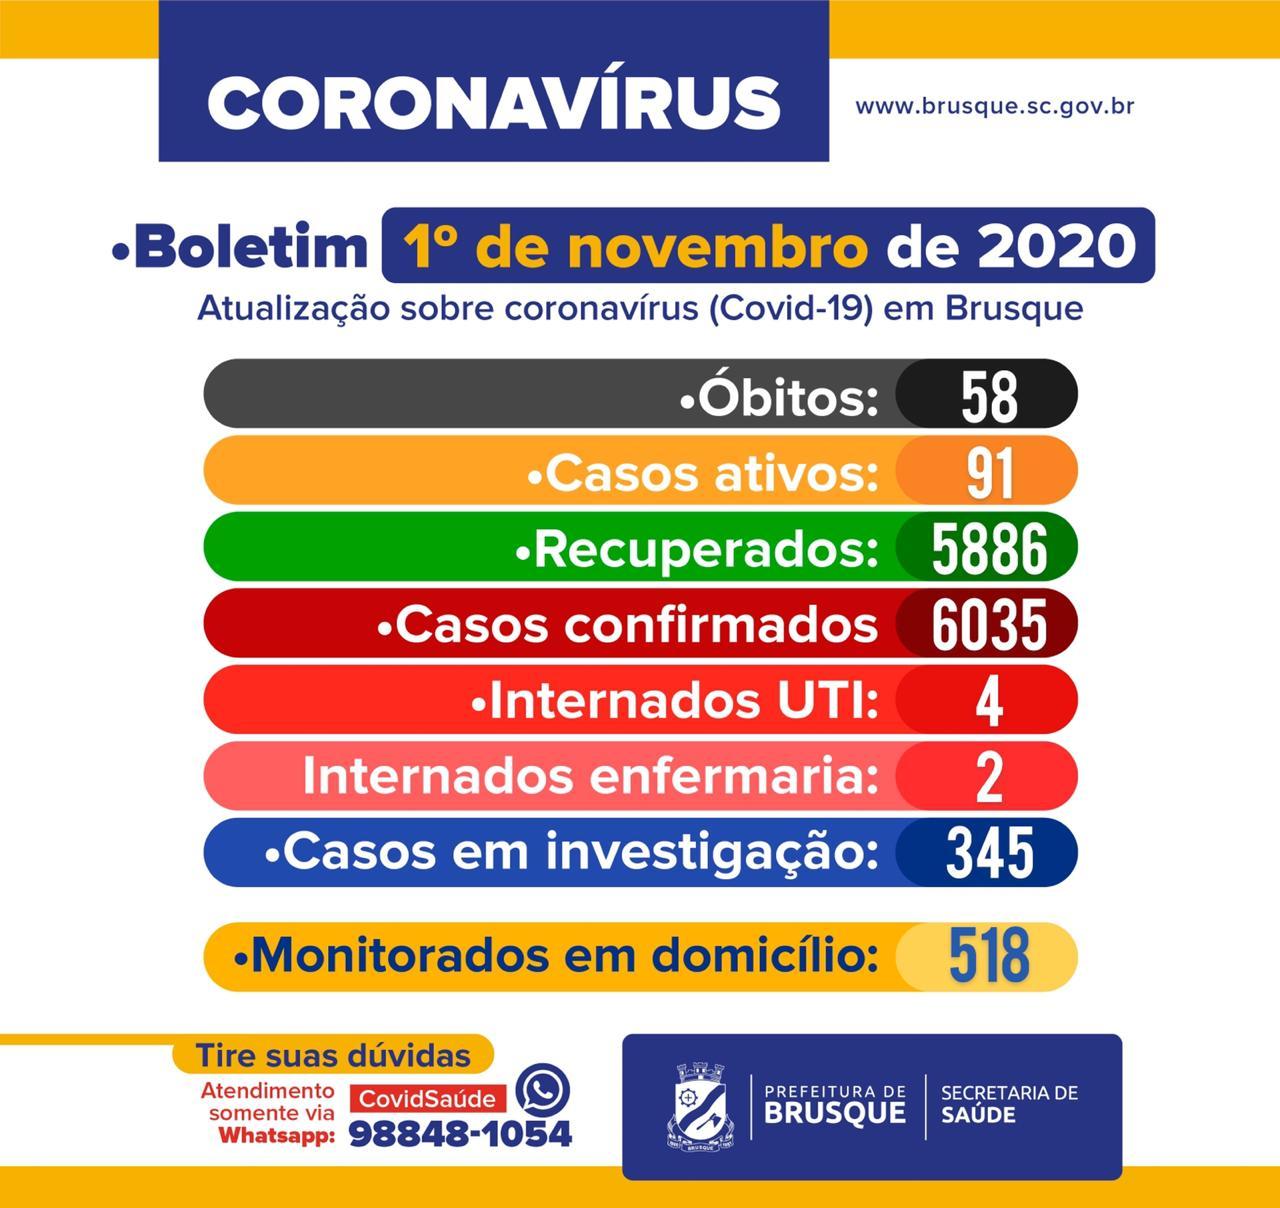 COVID-19: Boletim epidemiológico 1º de novembro